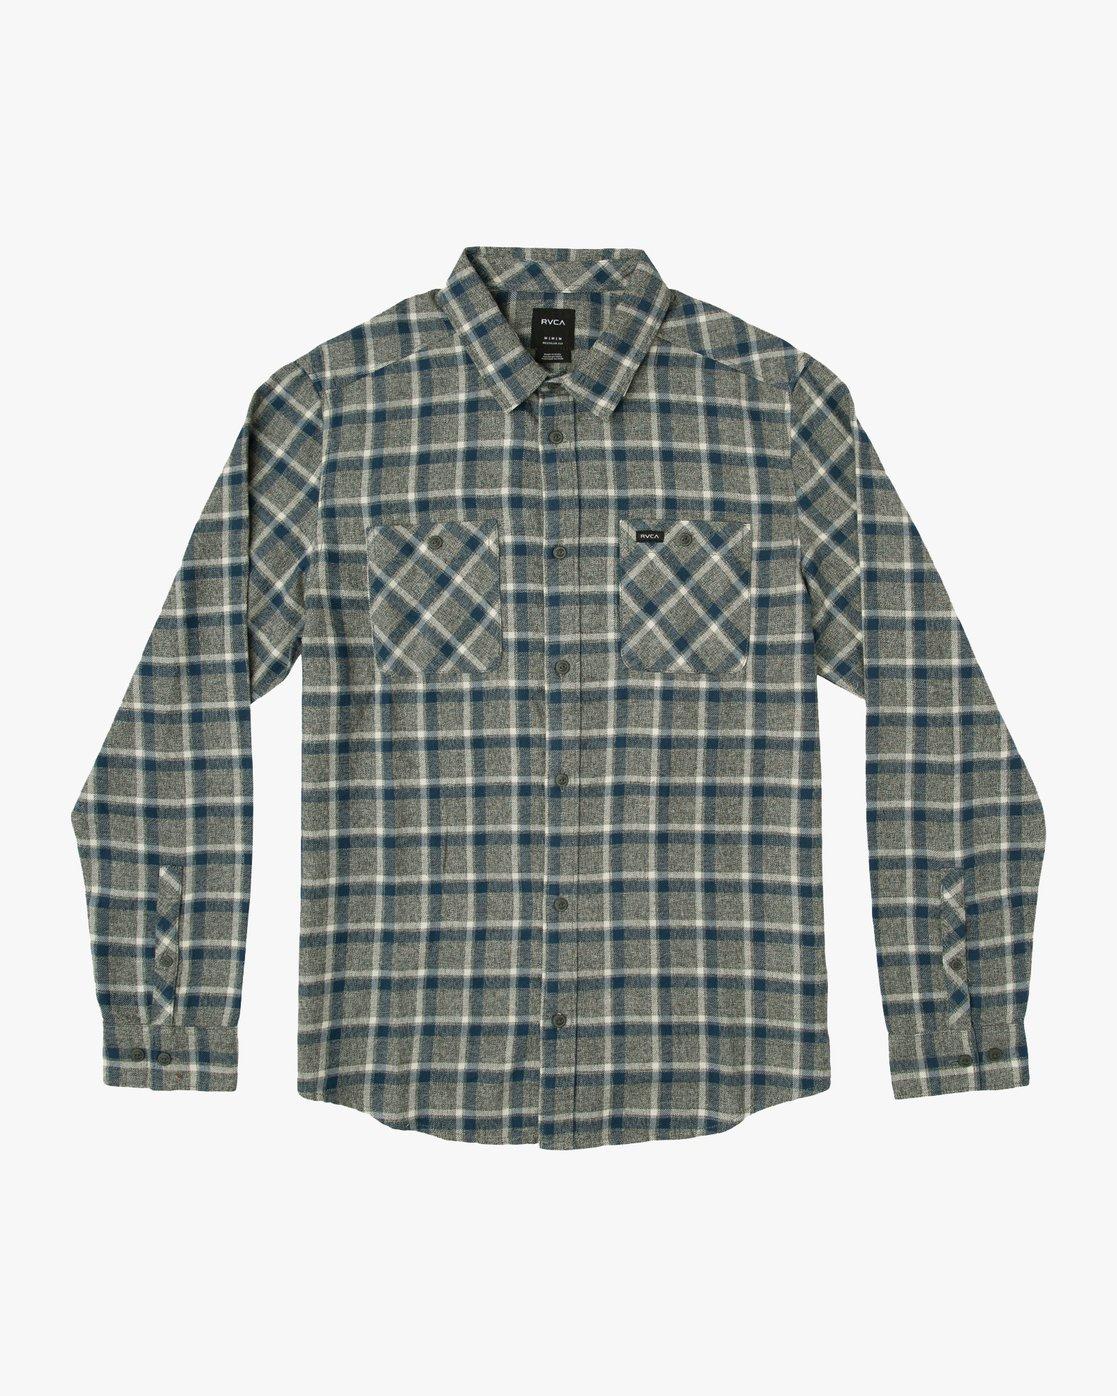 0 Hero Plaid Button-Up Shirt Black M557SRHE RVCA